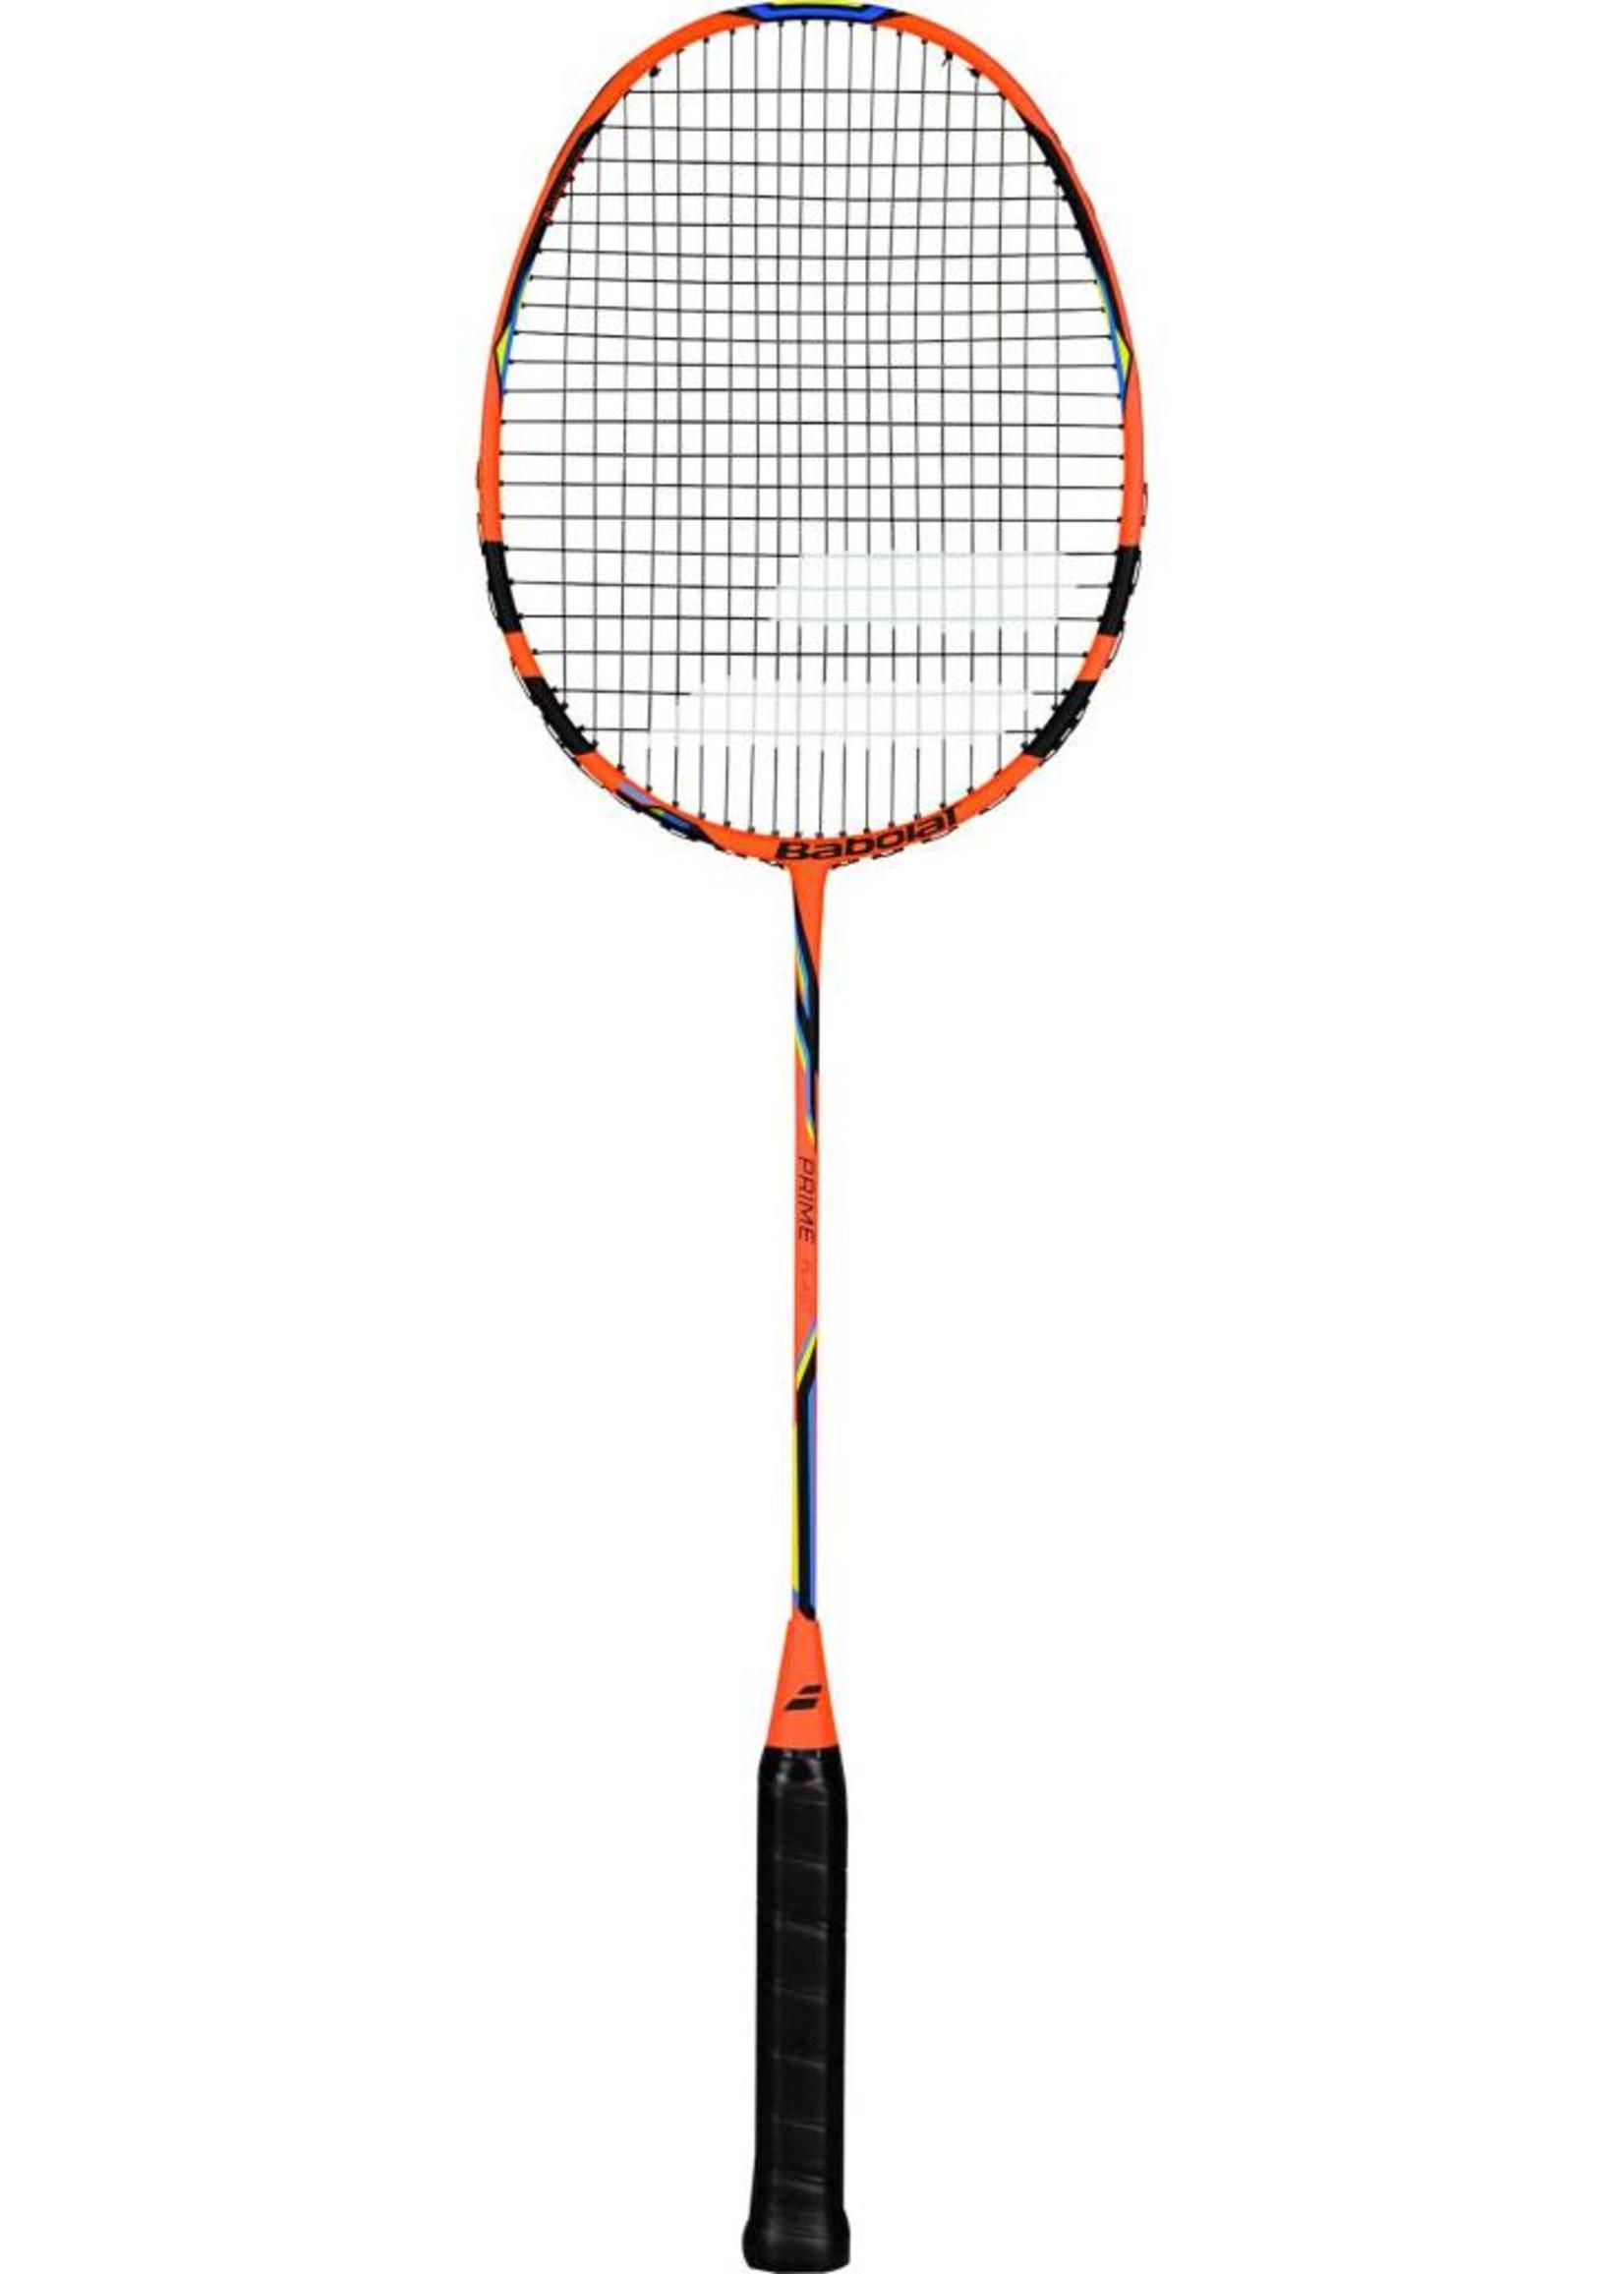 Babolat Babolat Prime Blast Badminton Racket, Red (2018)